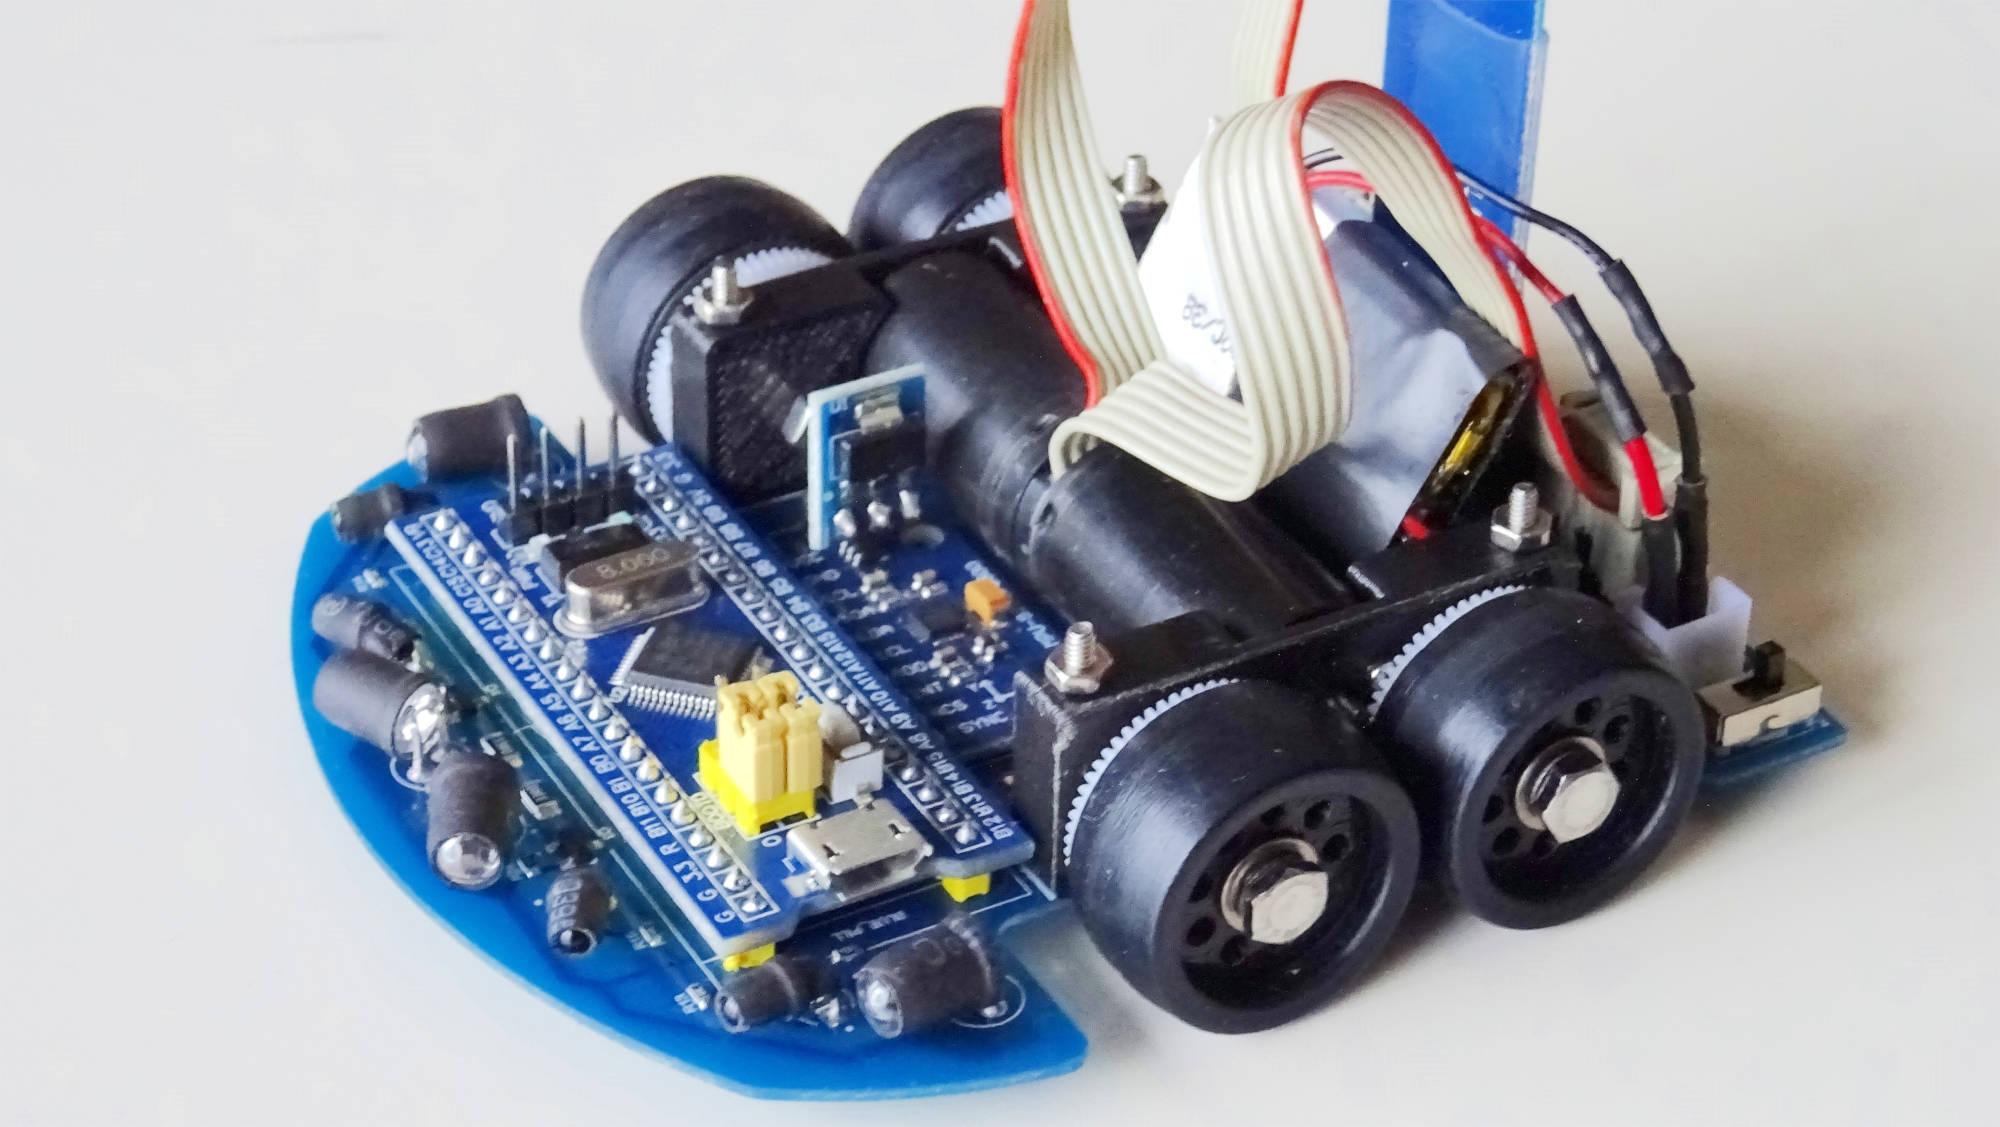 Foto en primer plano de un robot micromouse del equipo bulebots